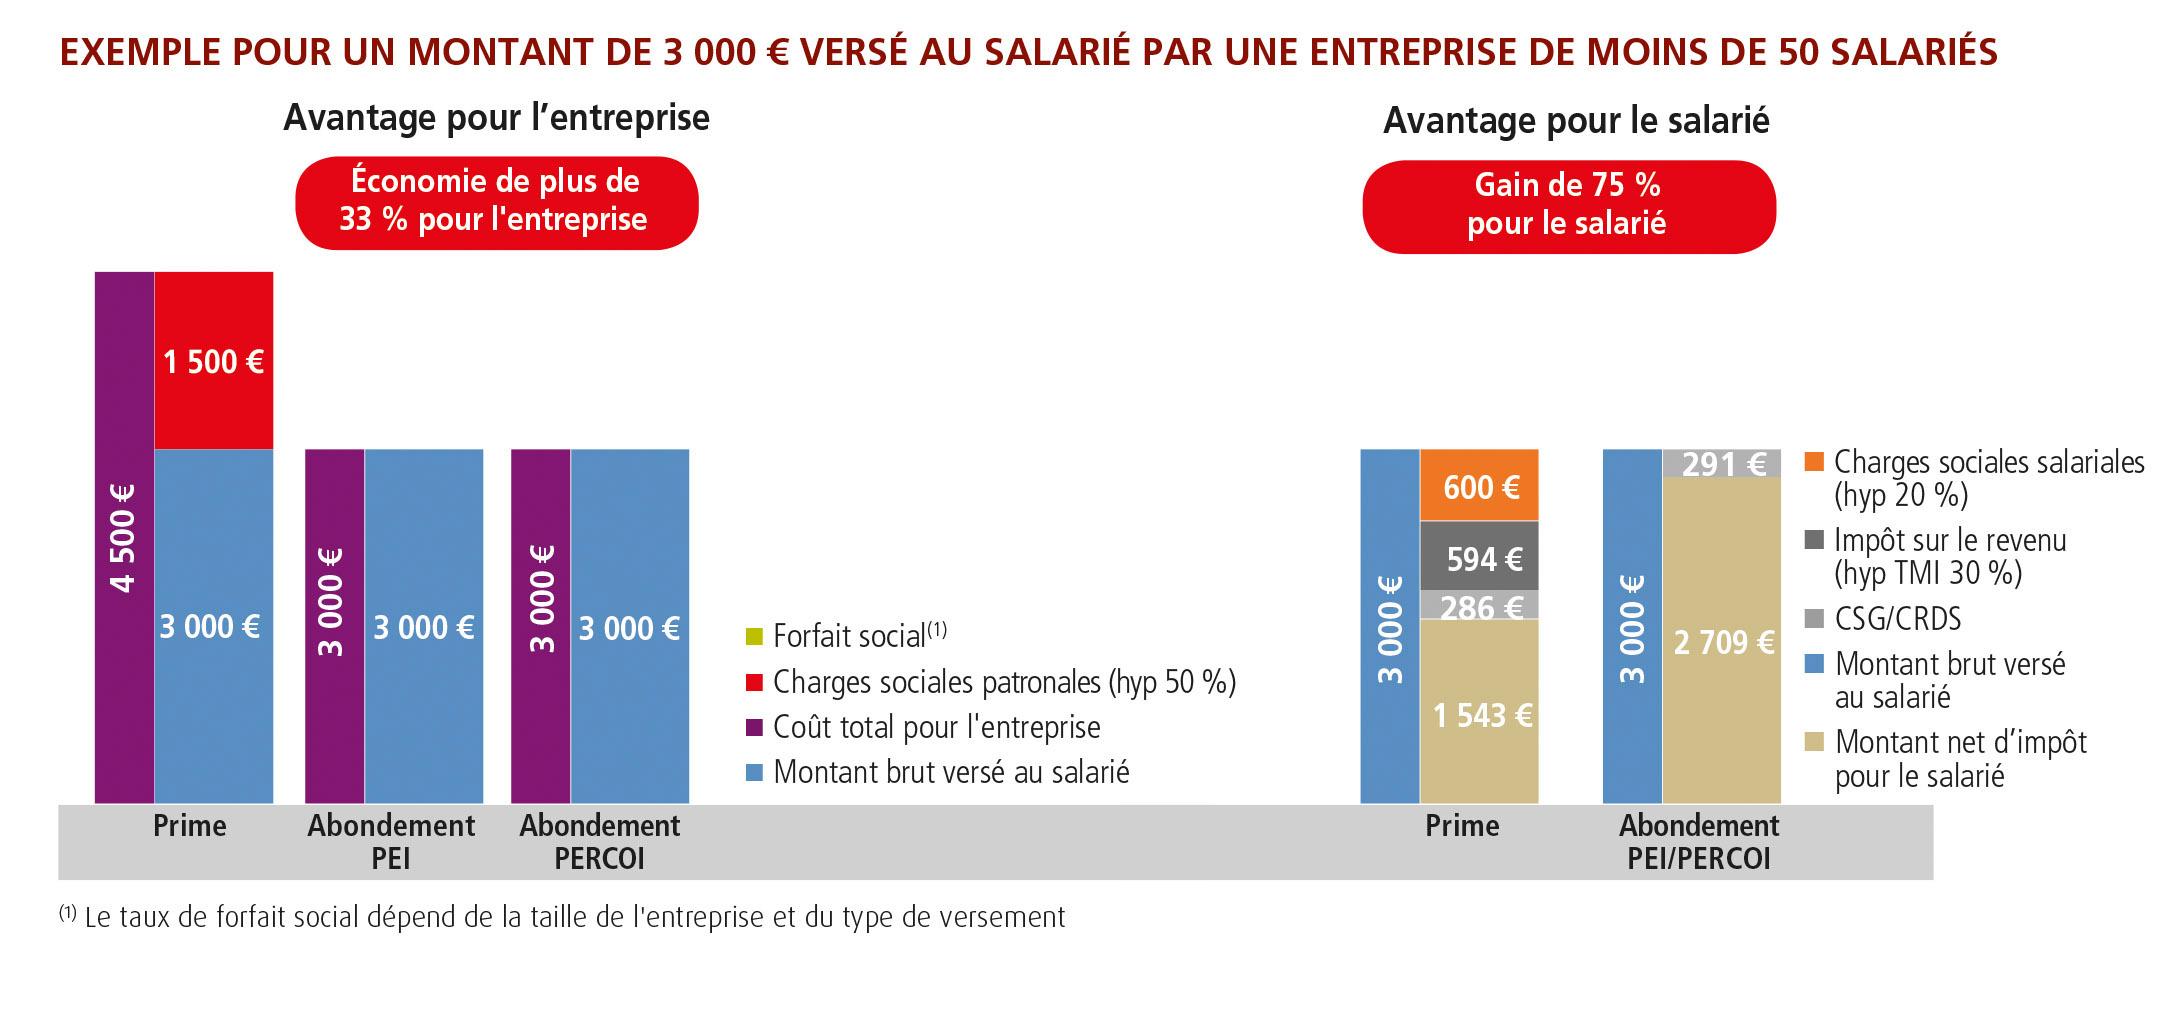 Abondement versement 3000 euros PEI PERCOI